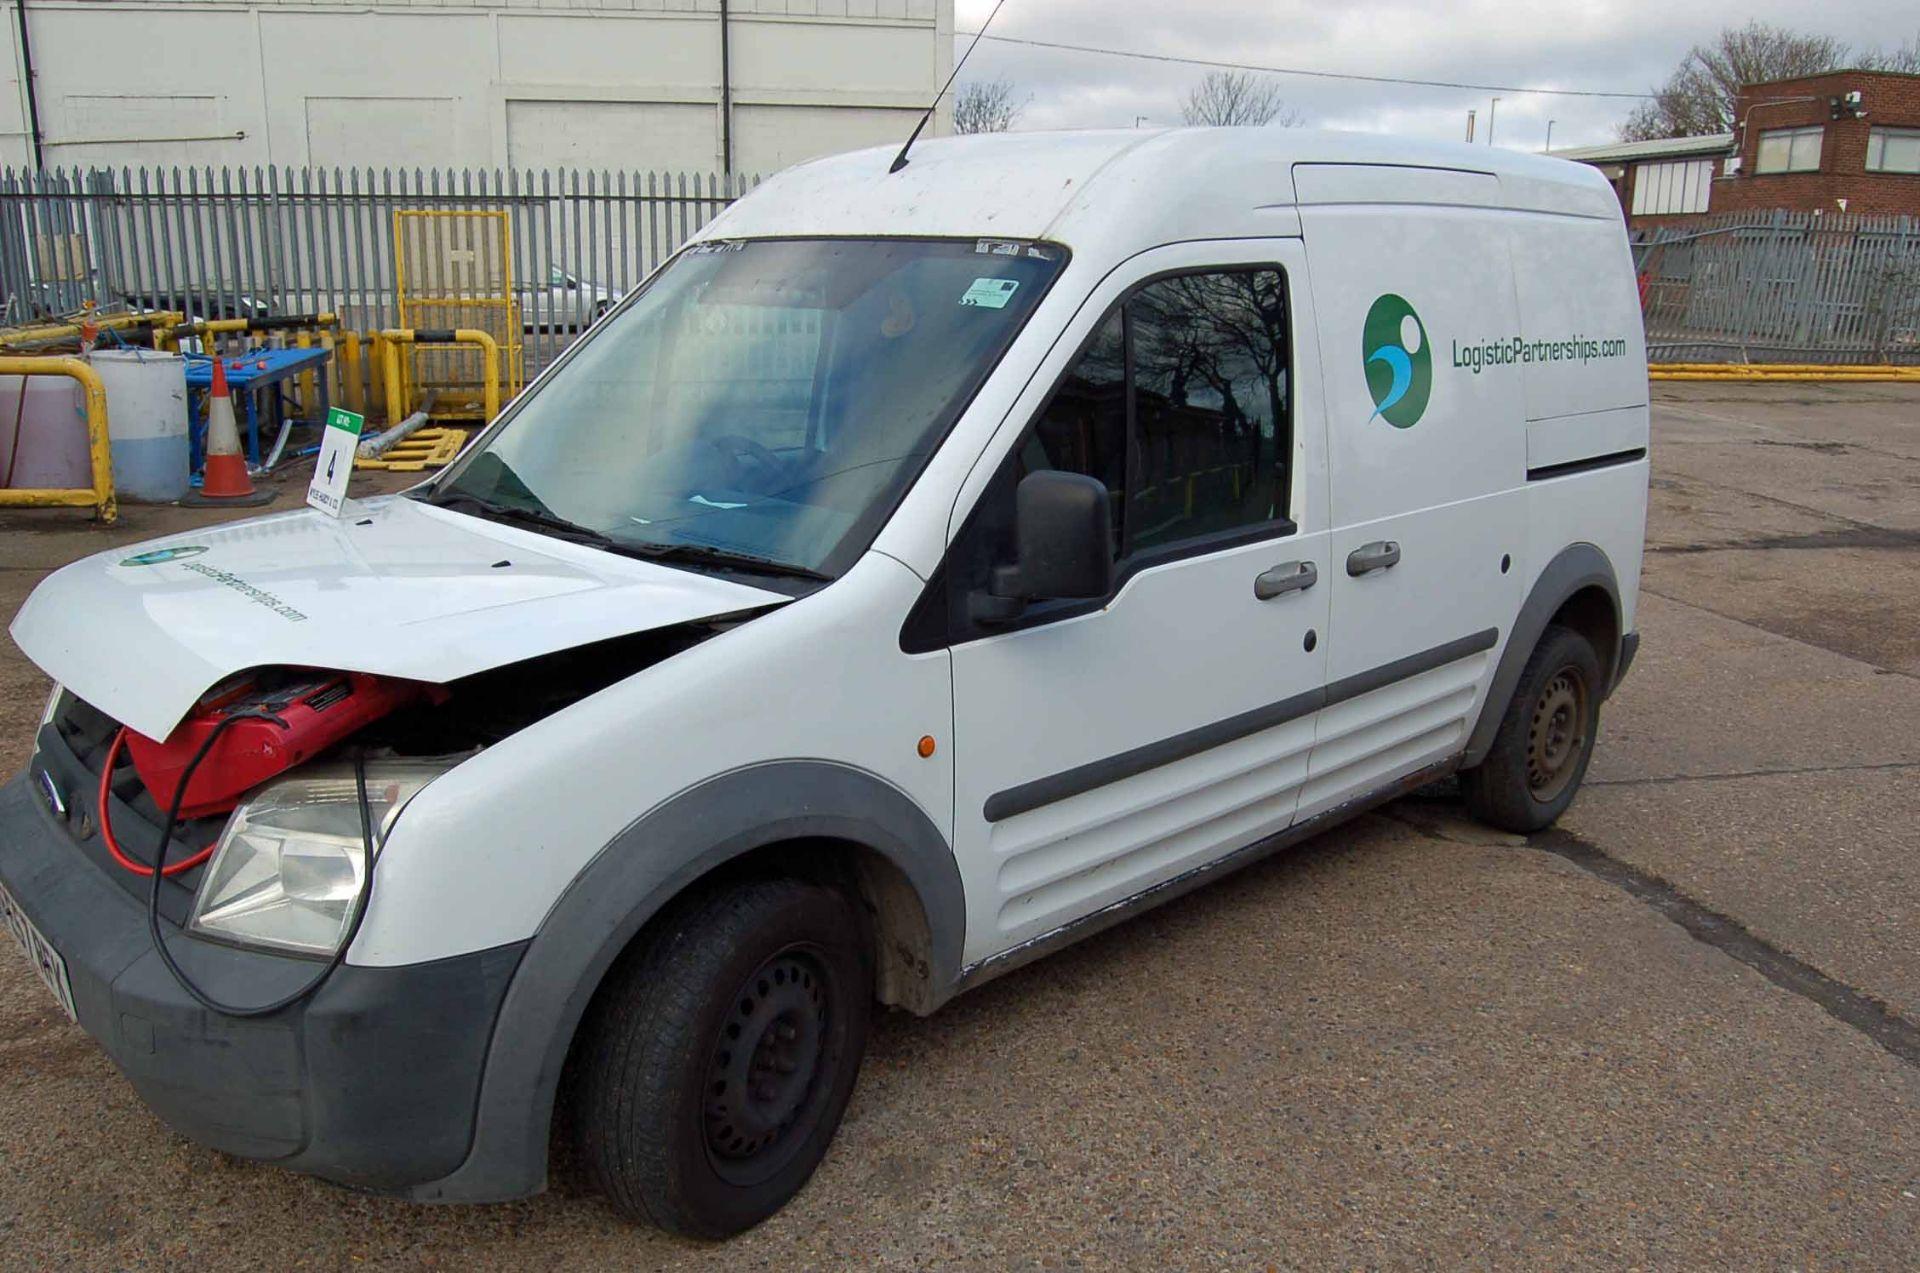 Lot 4 - A FORD Transit Connect T200 L90 Diesel Panel Van, Registration No. FE57 RFK, First Registered: 05-